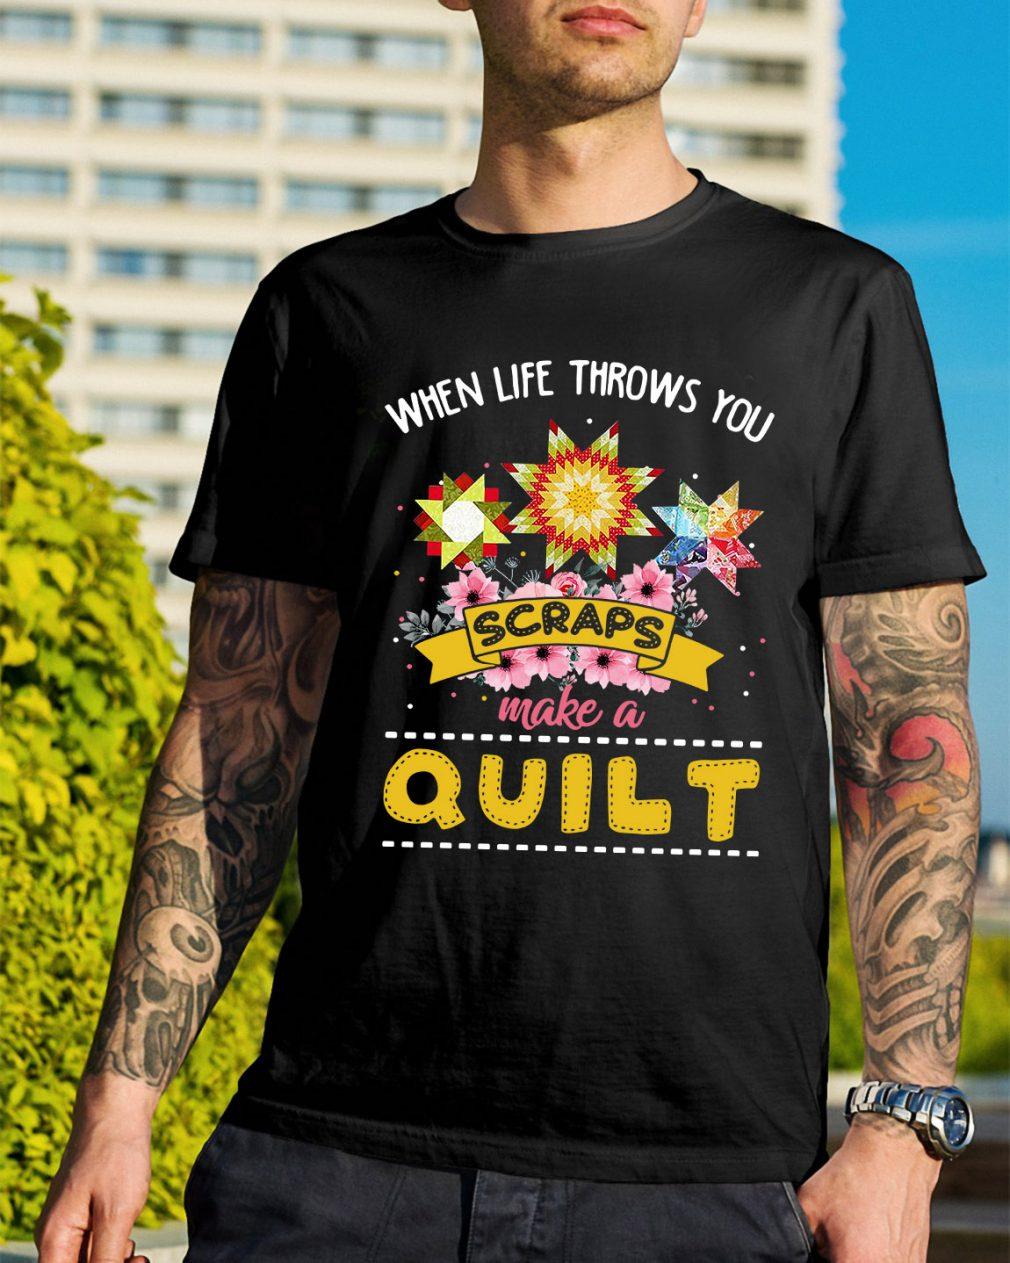 When life throws you scraps make a quilt shirt